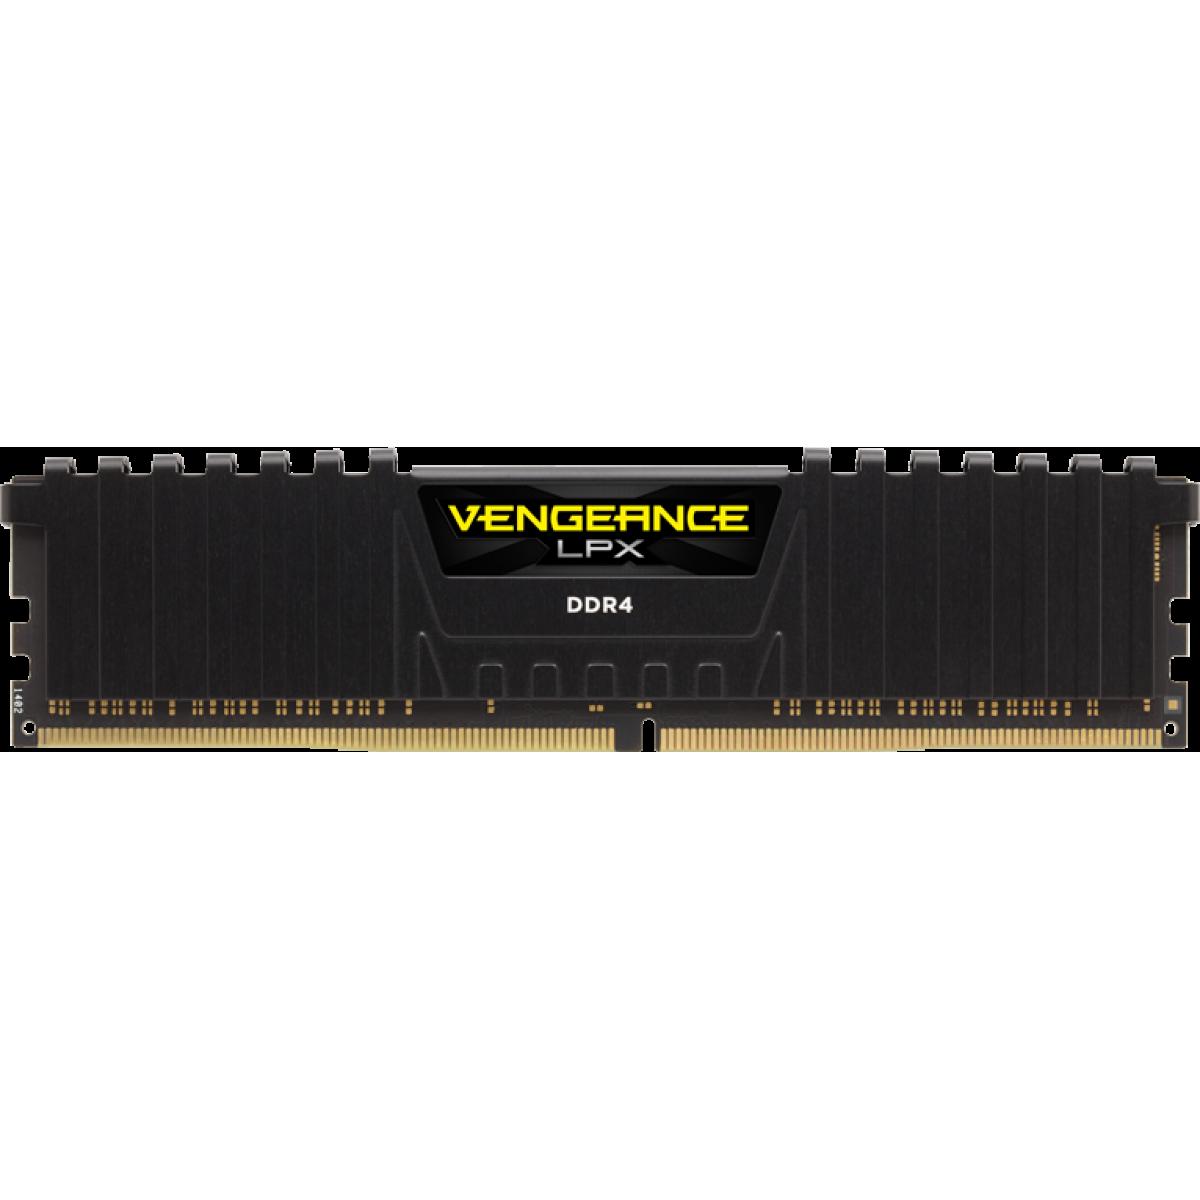 Memória Ddr4 Corsair Vengeance Lpx, 16gb (2x8gb) 3000mhz, CMK16GX4M2B3000C15